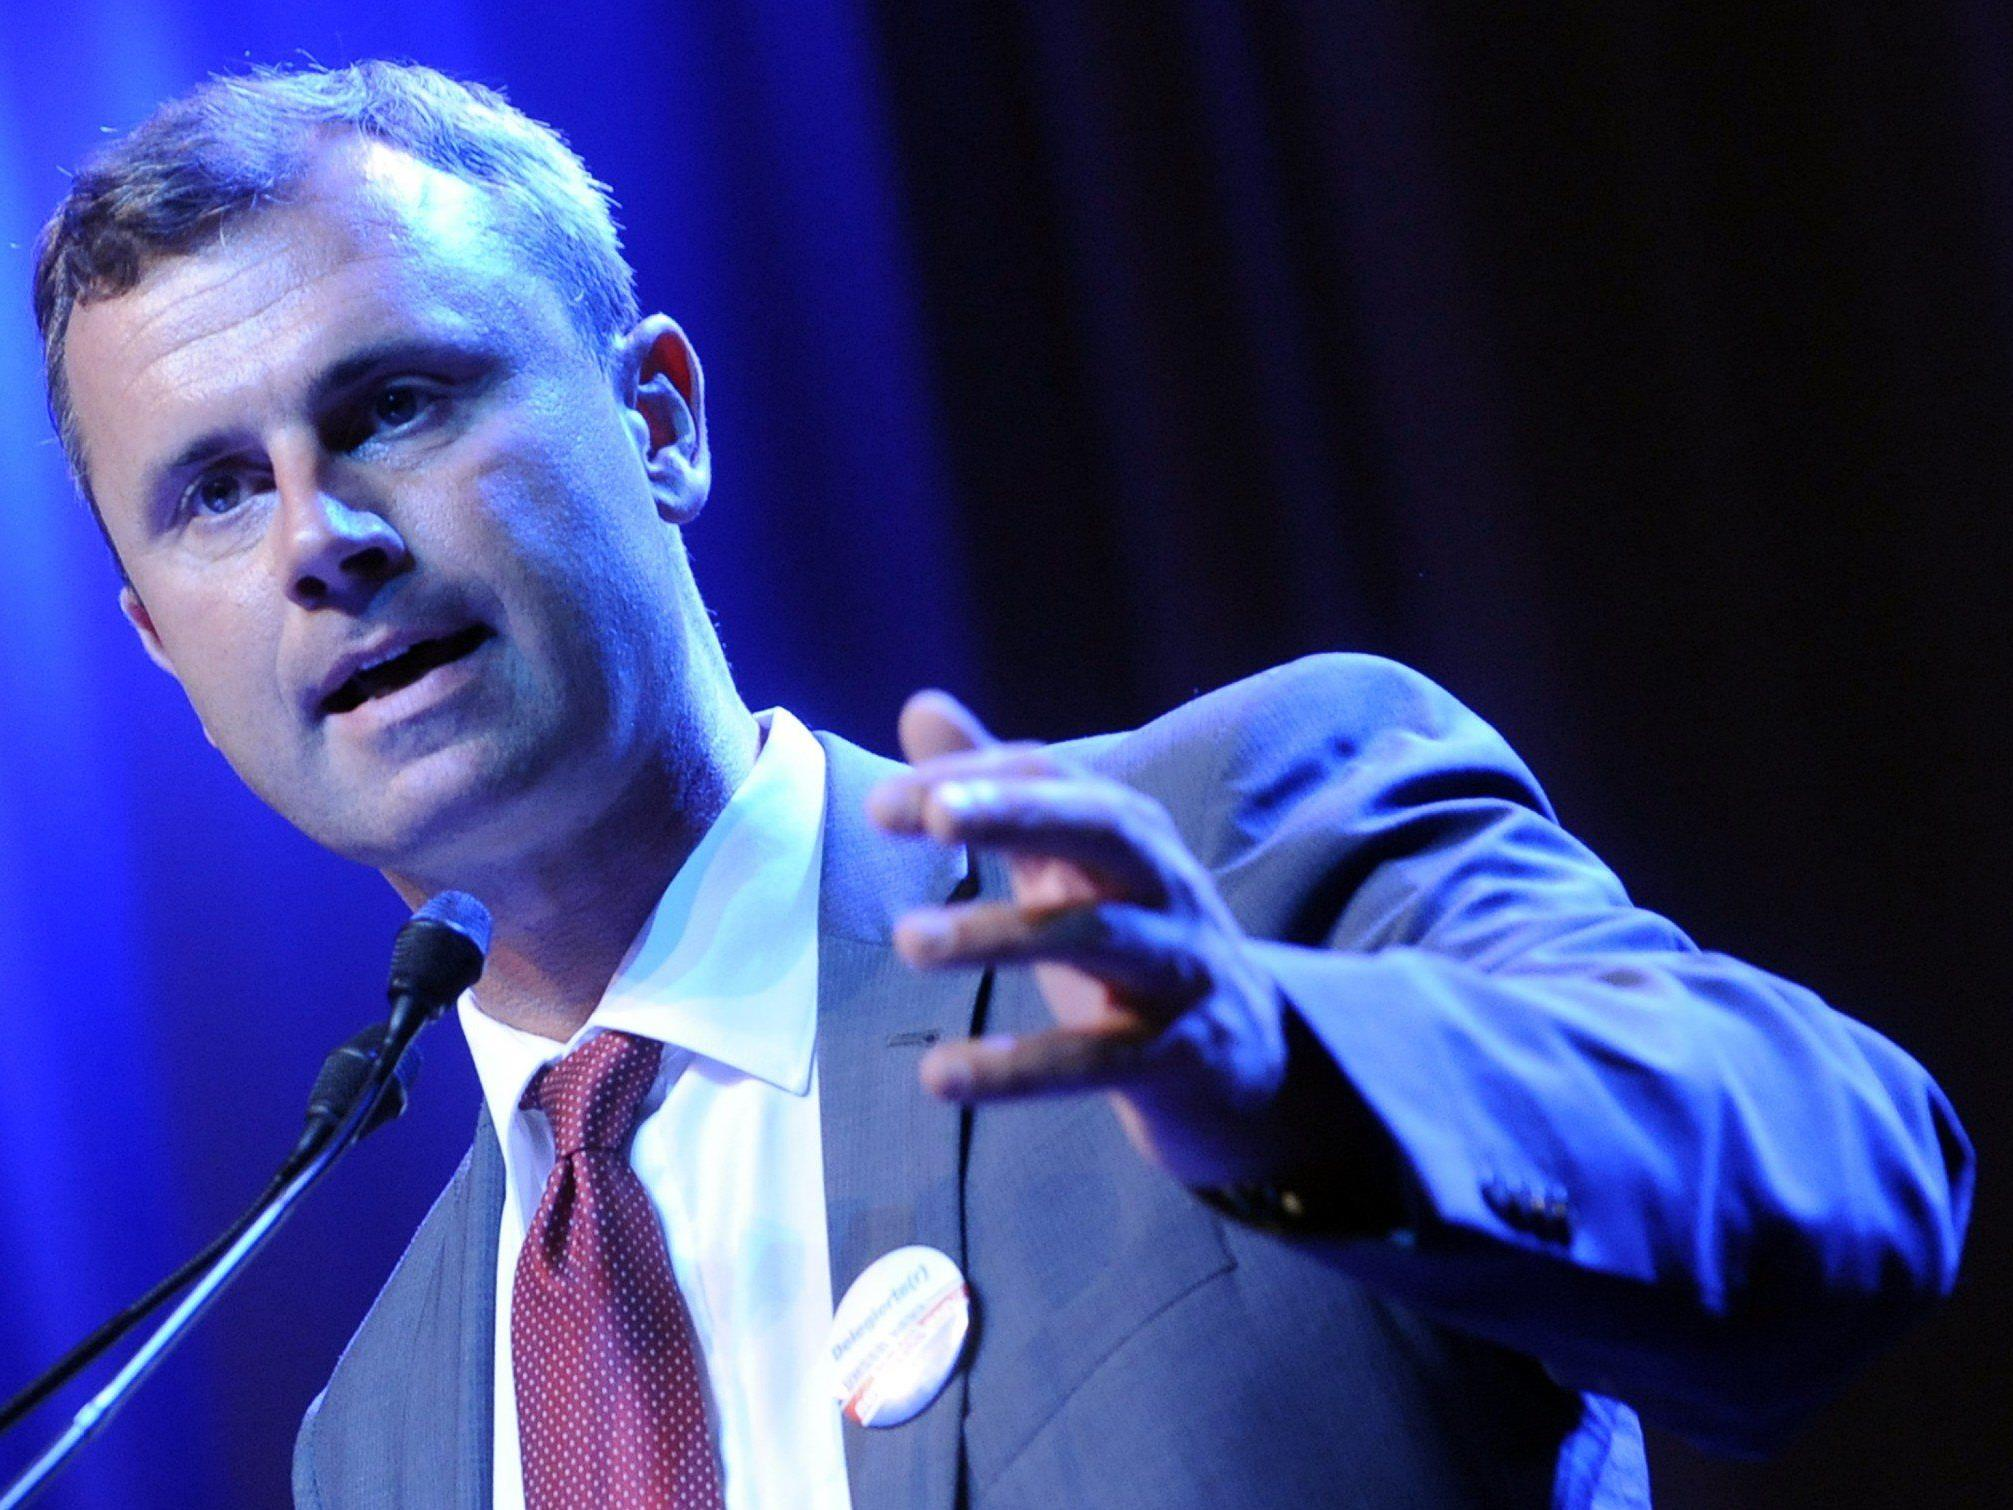 NR-Präsident Hofer sieht in Akademikerball keinerlei Provokation